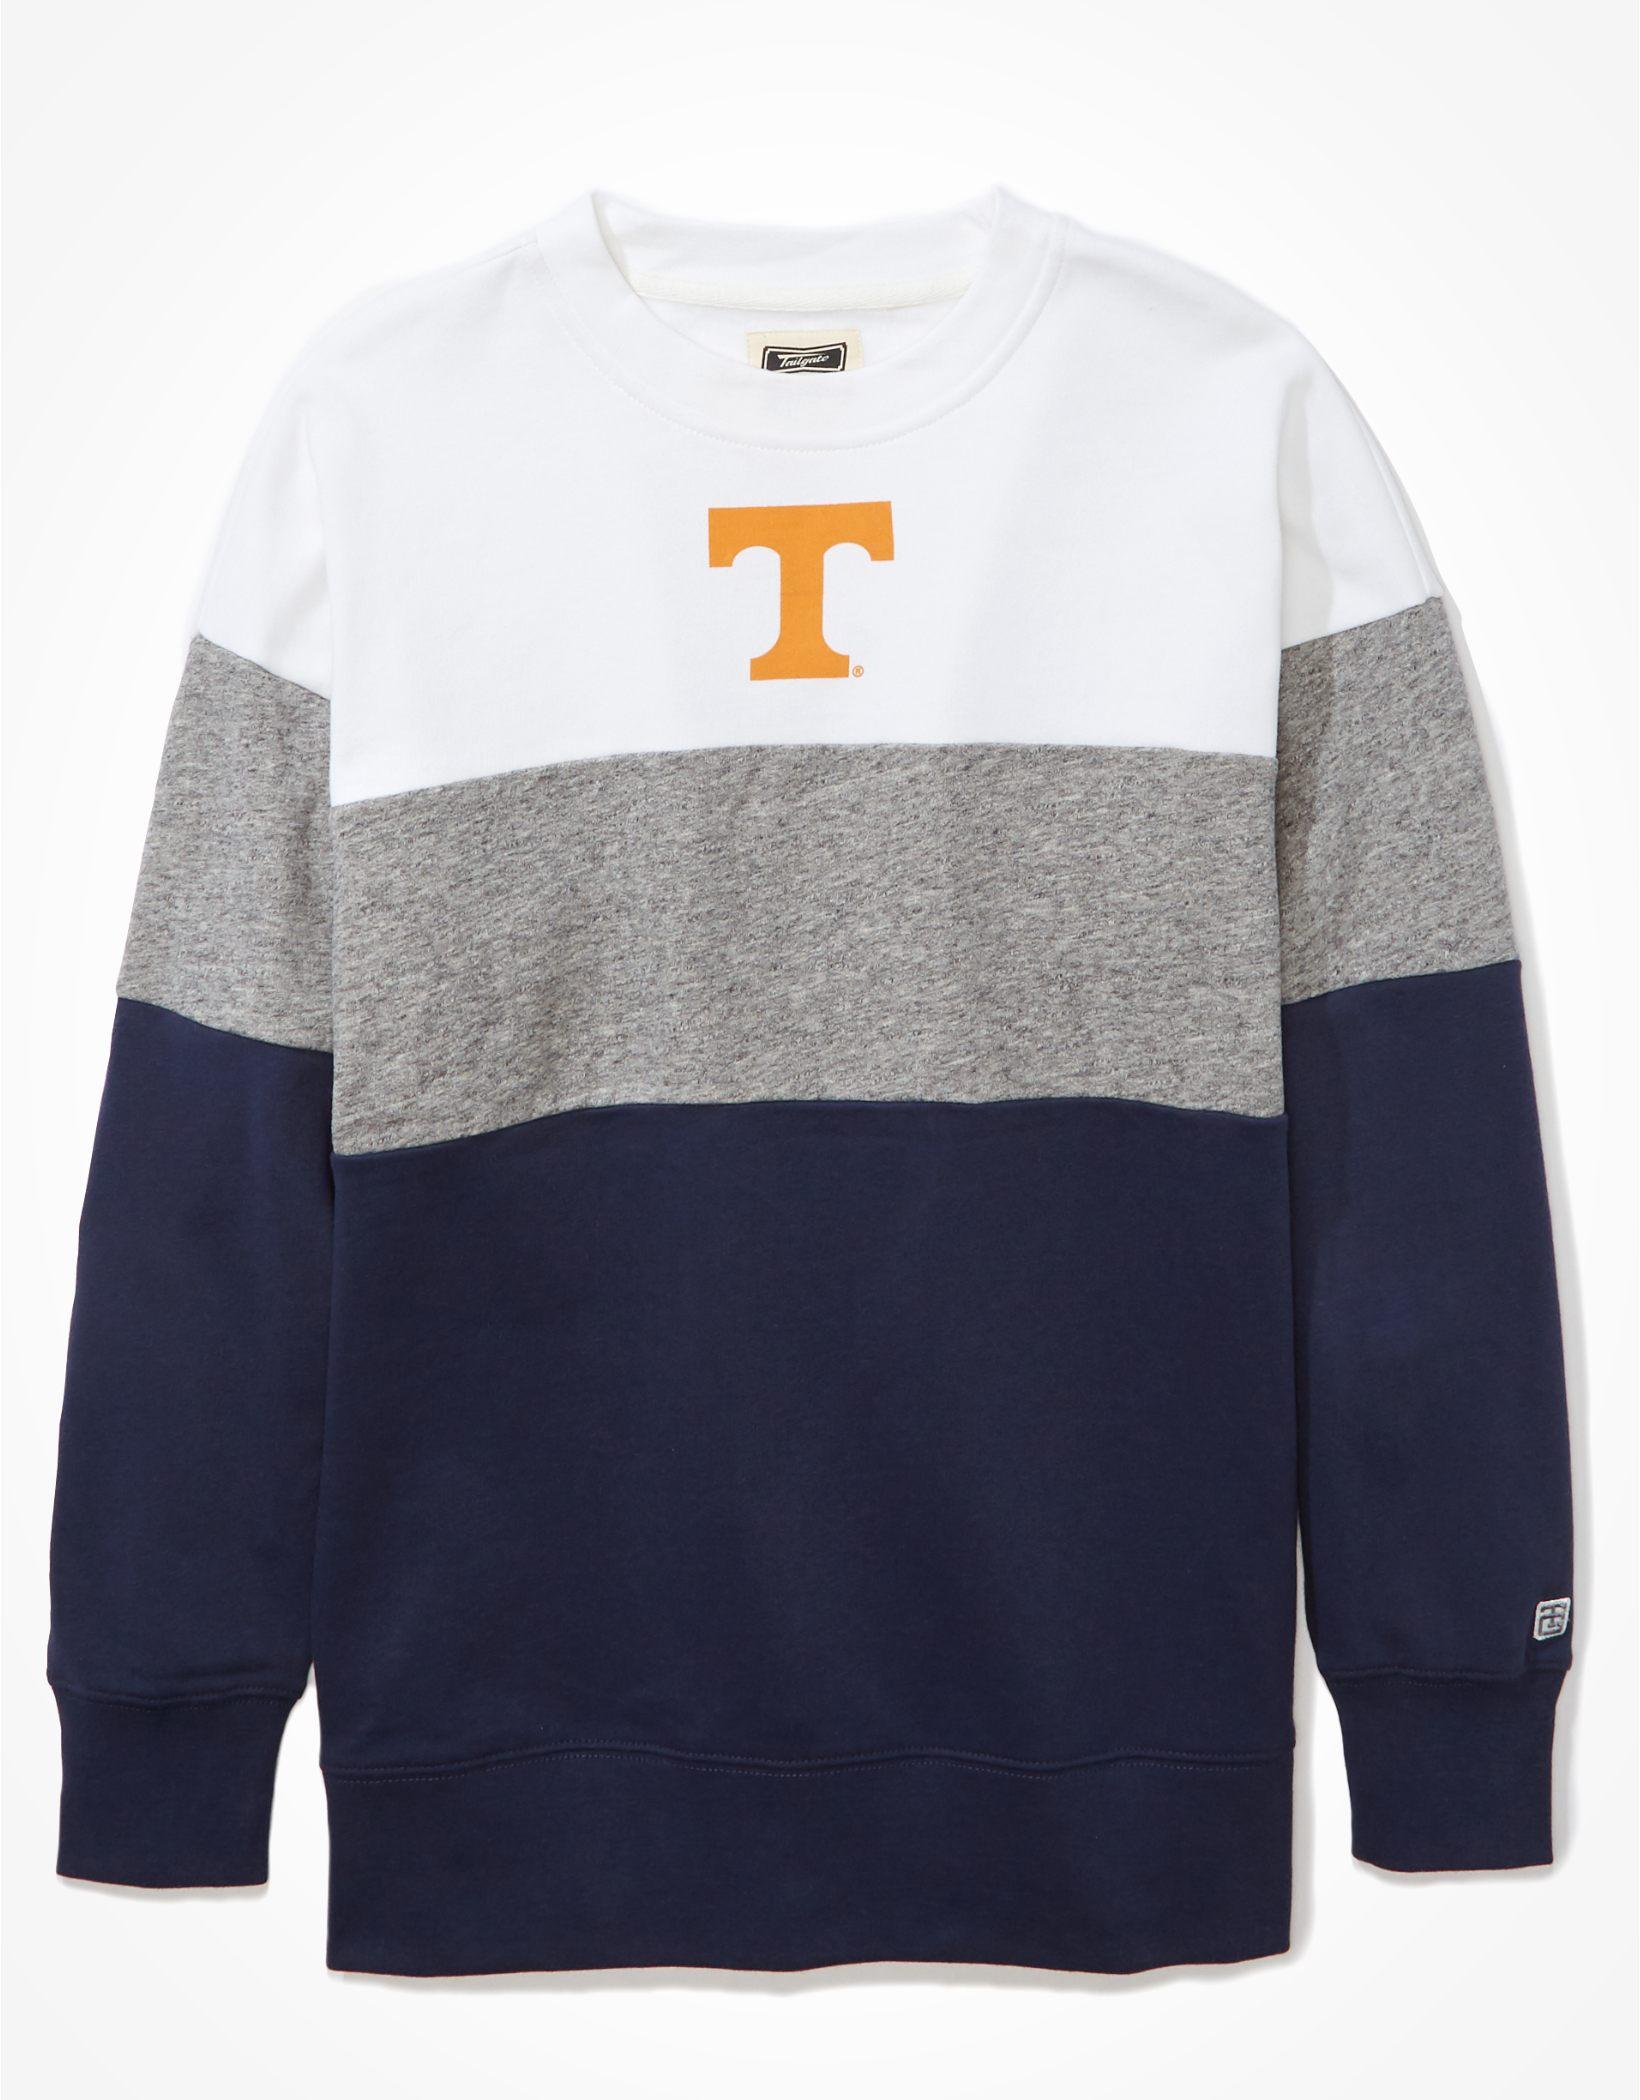 Tailgate Women's Tennessee Volunteers Colorblock Sweatshirt